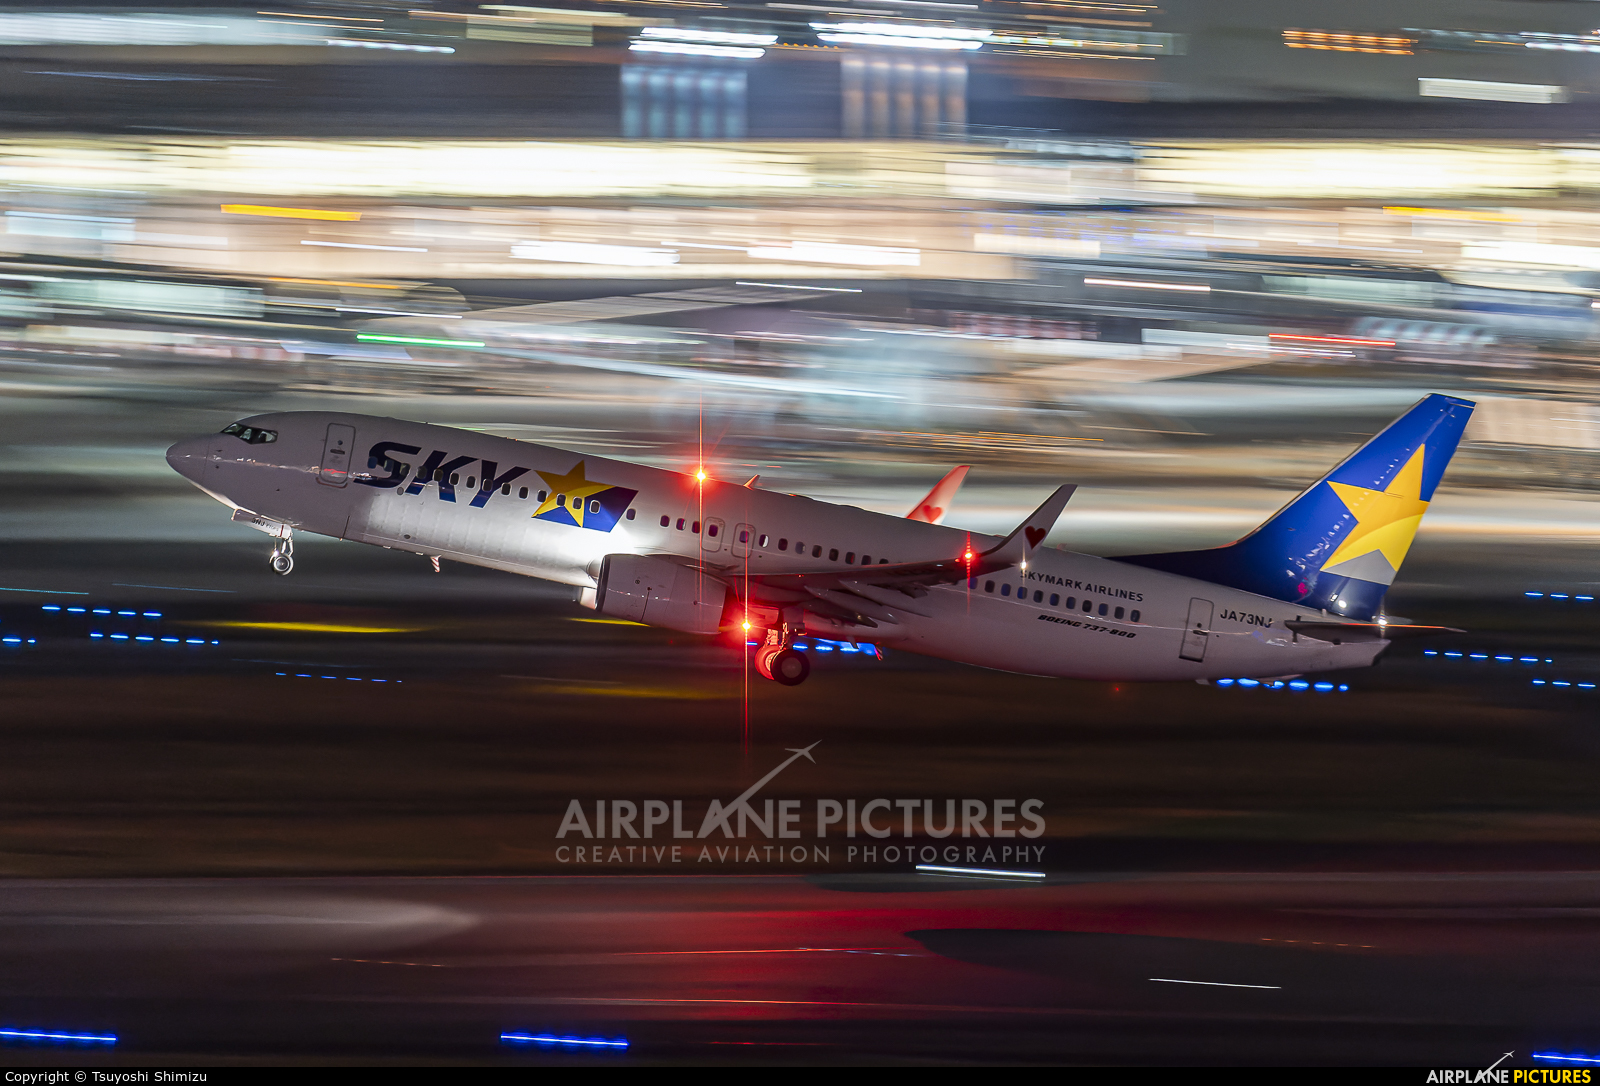 Skymark Airlines JA73NJ aircraft at Tokyo - Haneda Intl